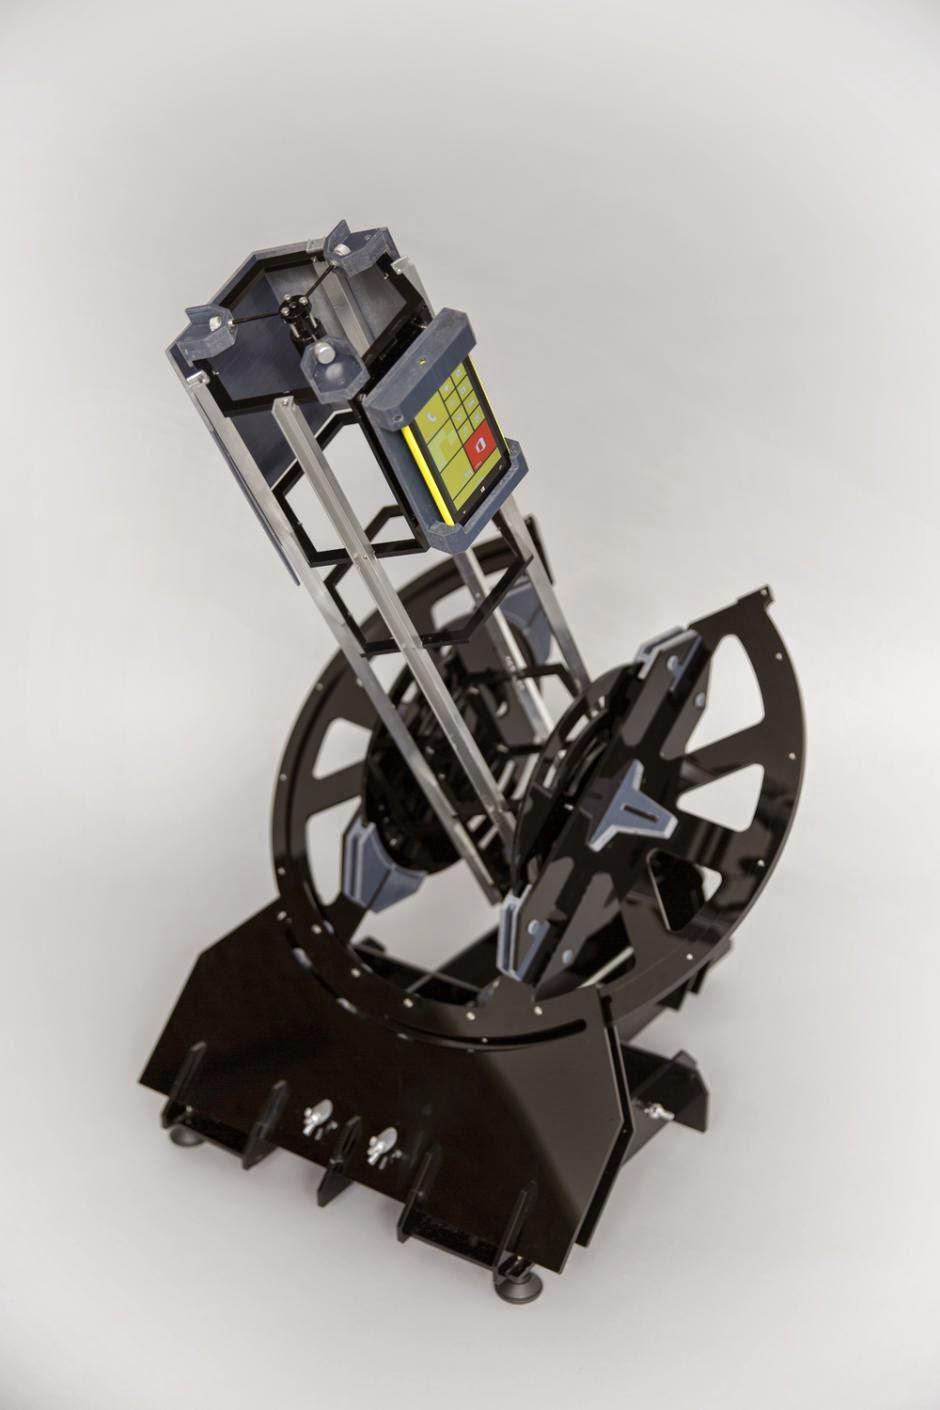 El proyecto Ultrascope